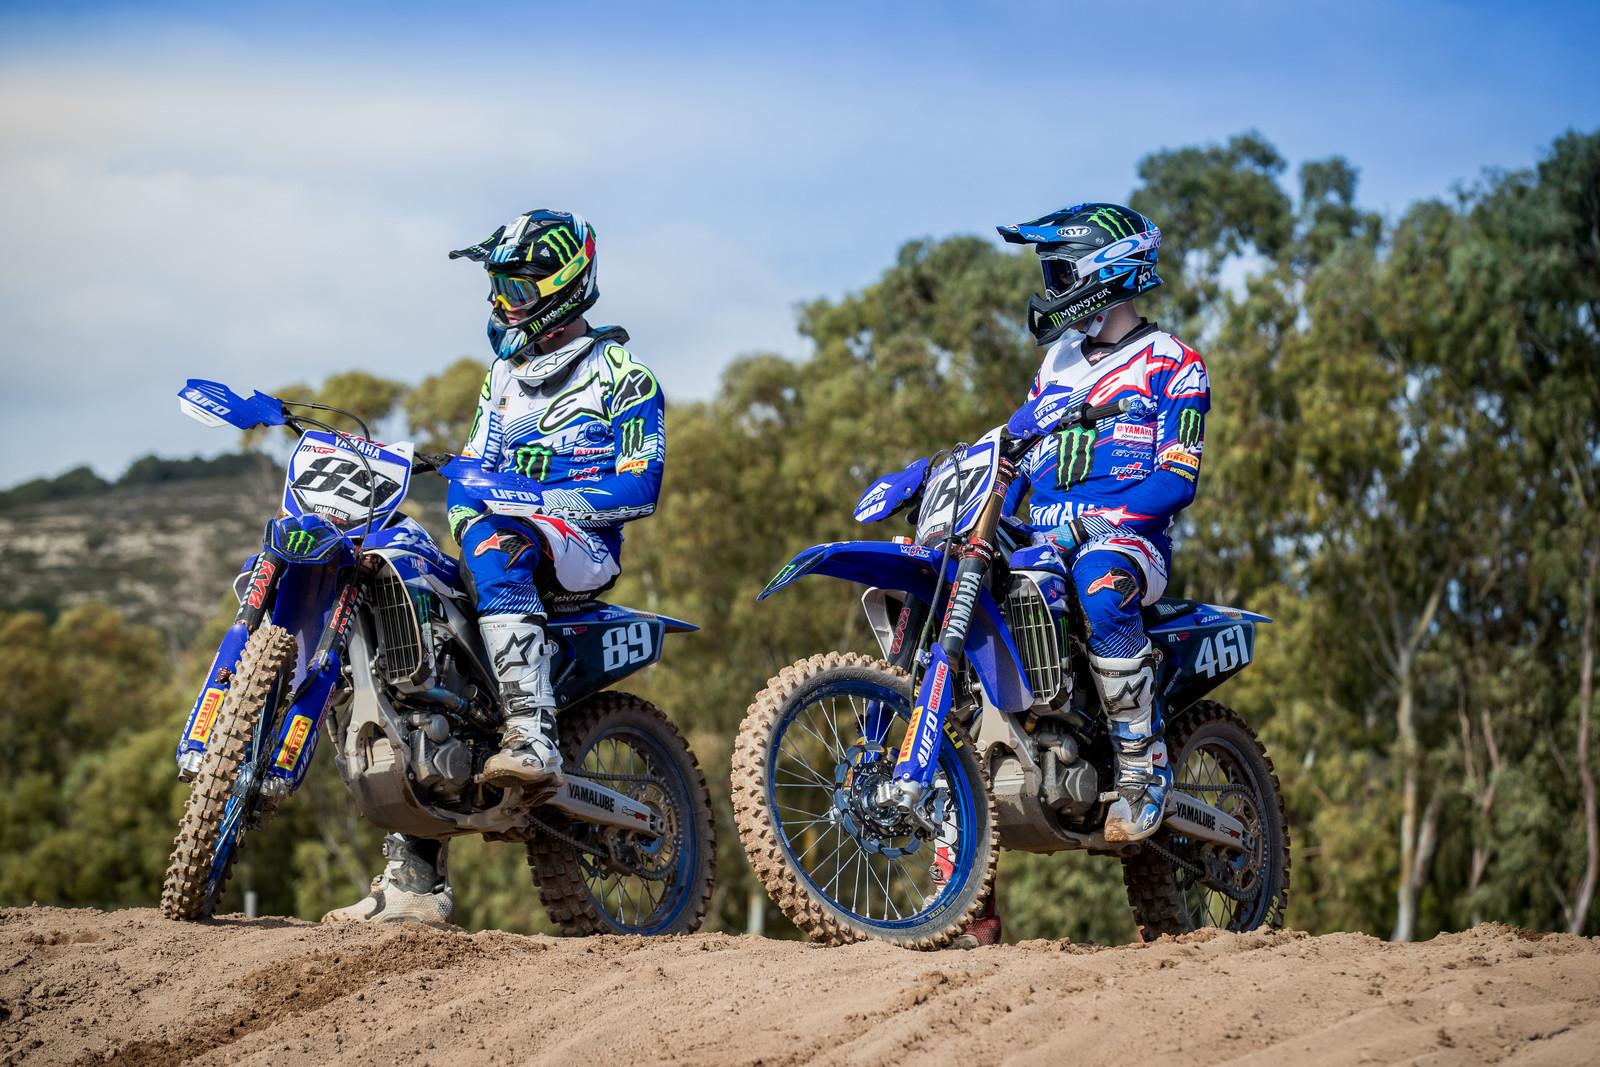 Jeremy Van Horebeek and Romain Febvre - First Look: 2017 Monster Energy & Wilvo Yamaha MXGP Teams - Motocross Pictures - Vital MX